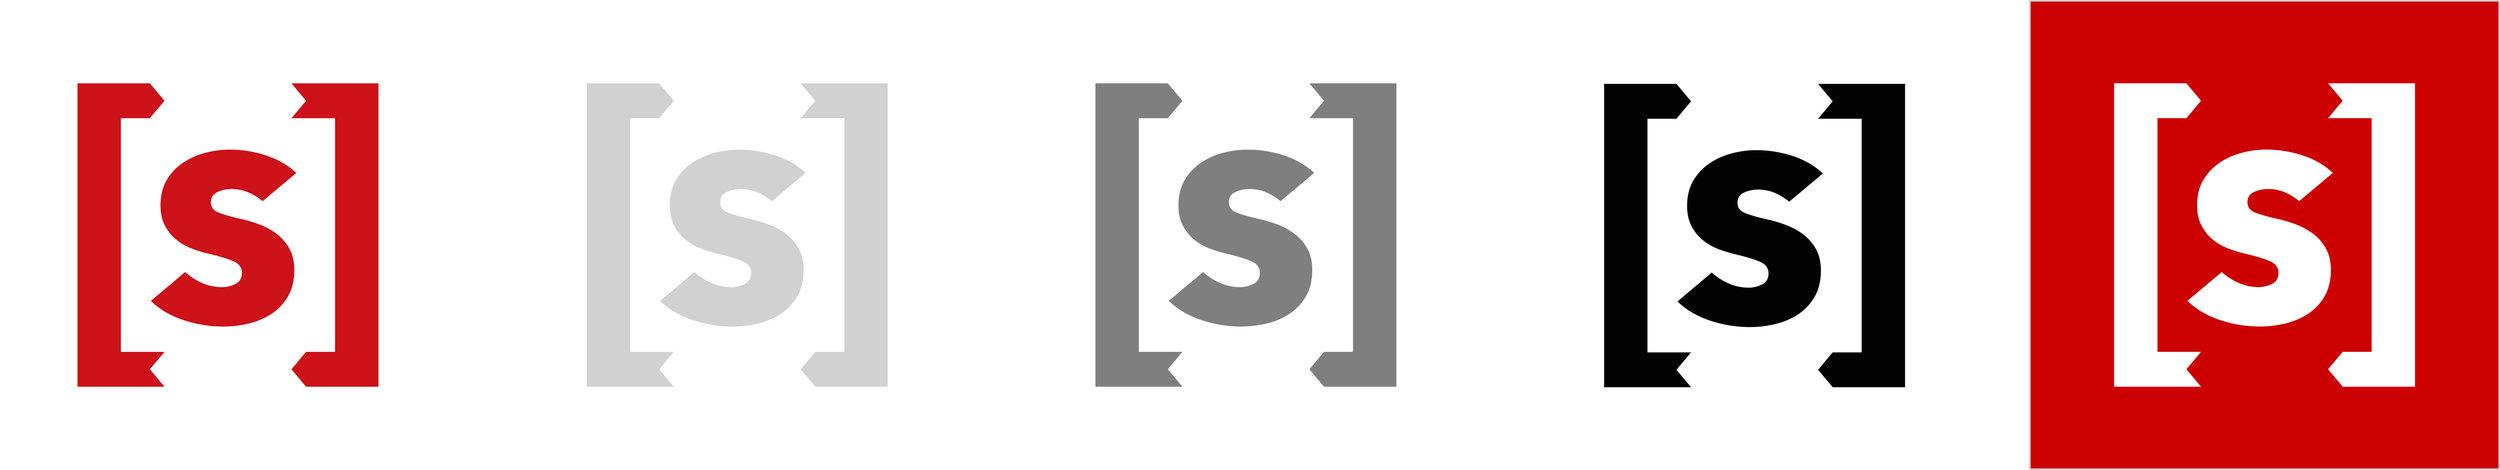 Icon Logos.jpg